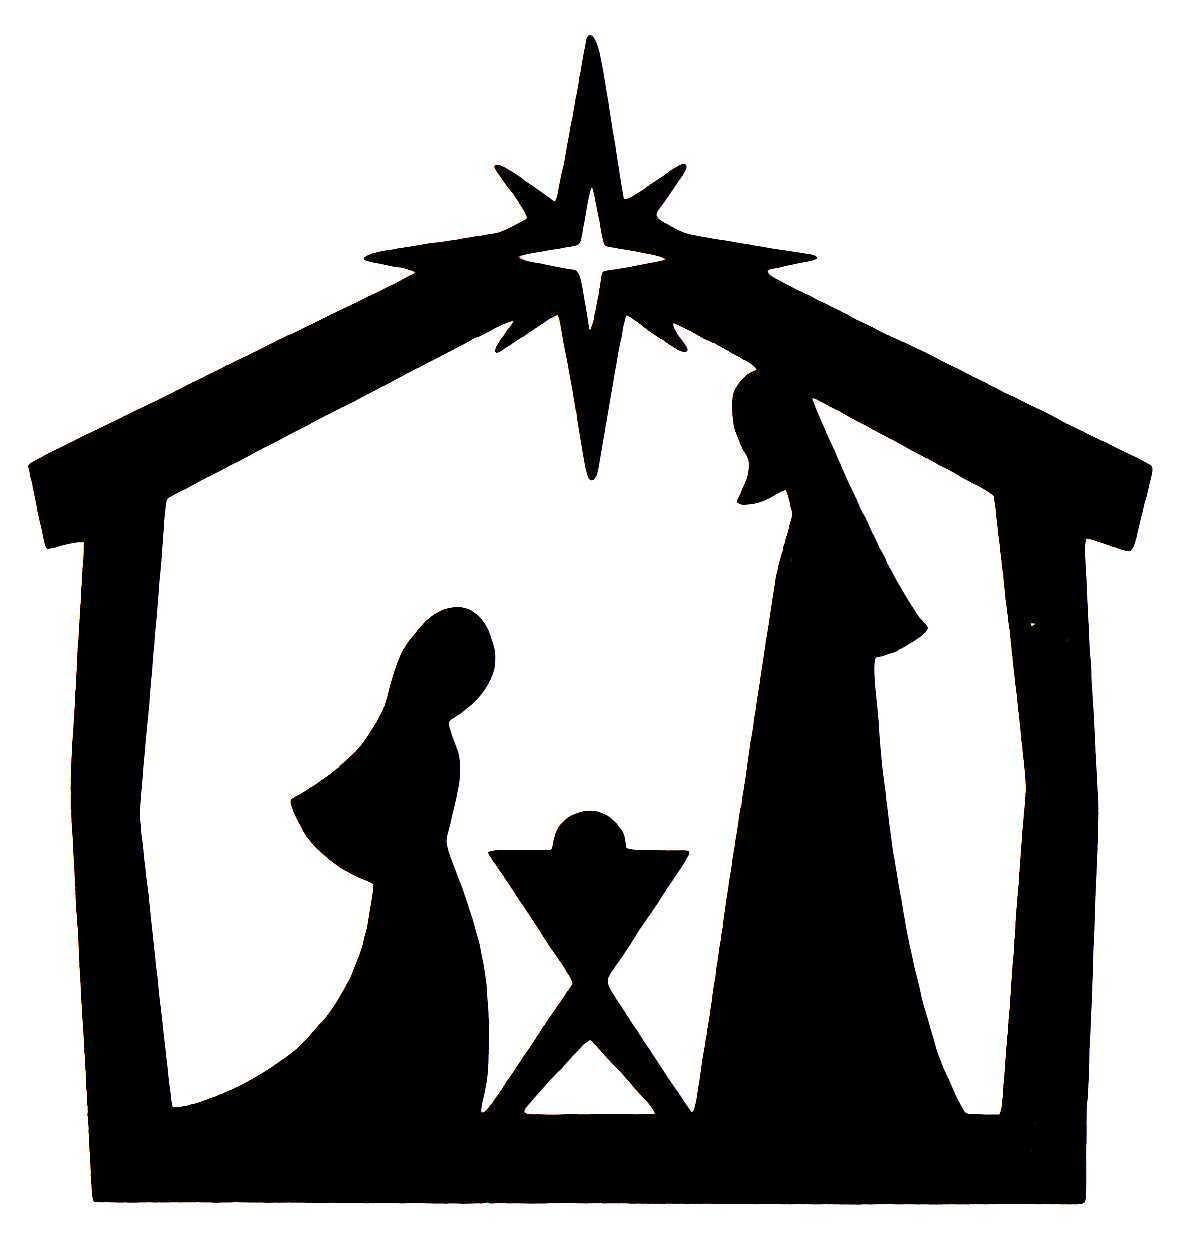 Nativity+silhouette | Nativity Silhouette Click Image Zoom ...